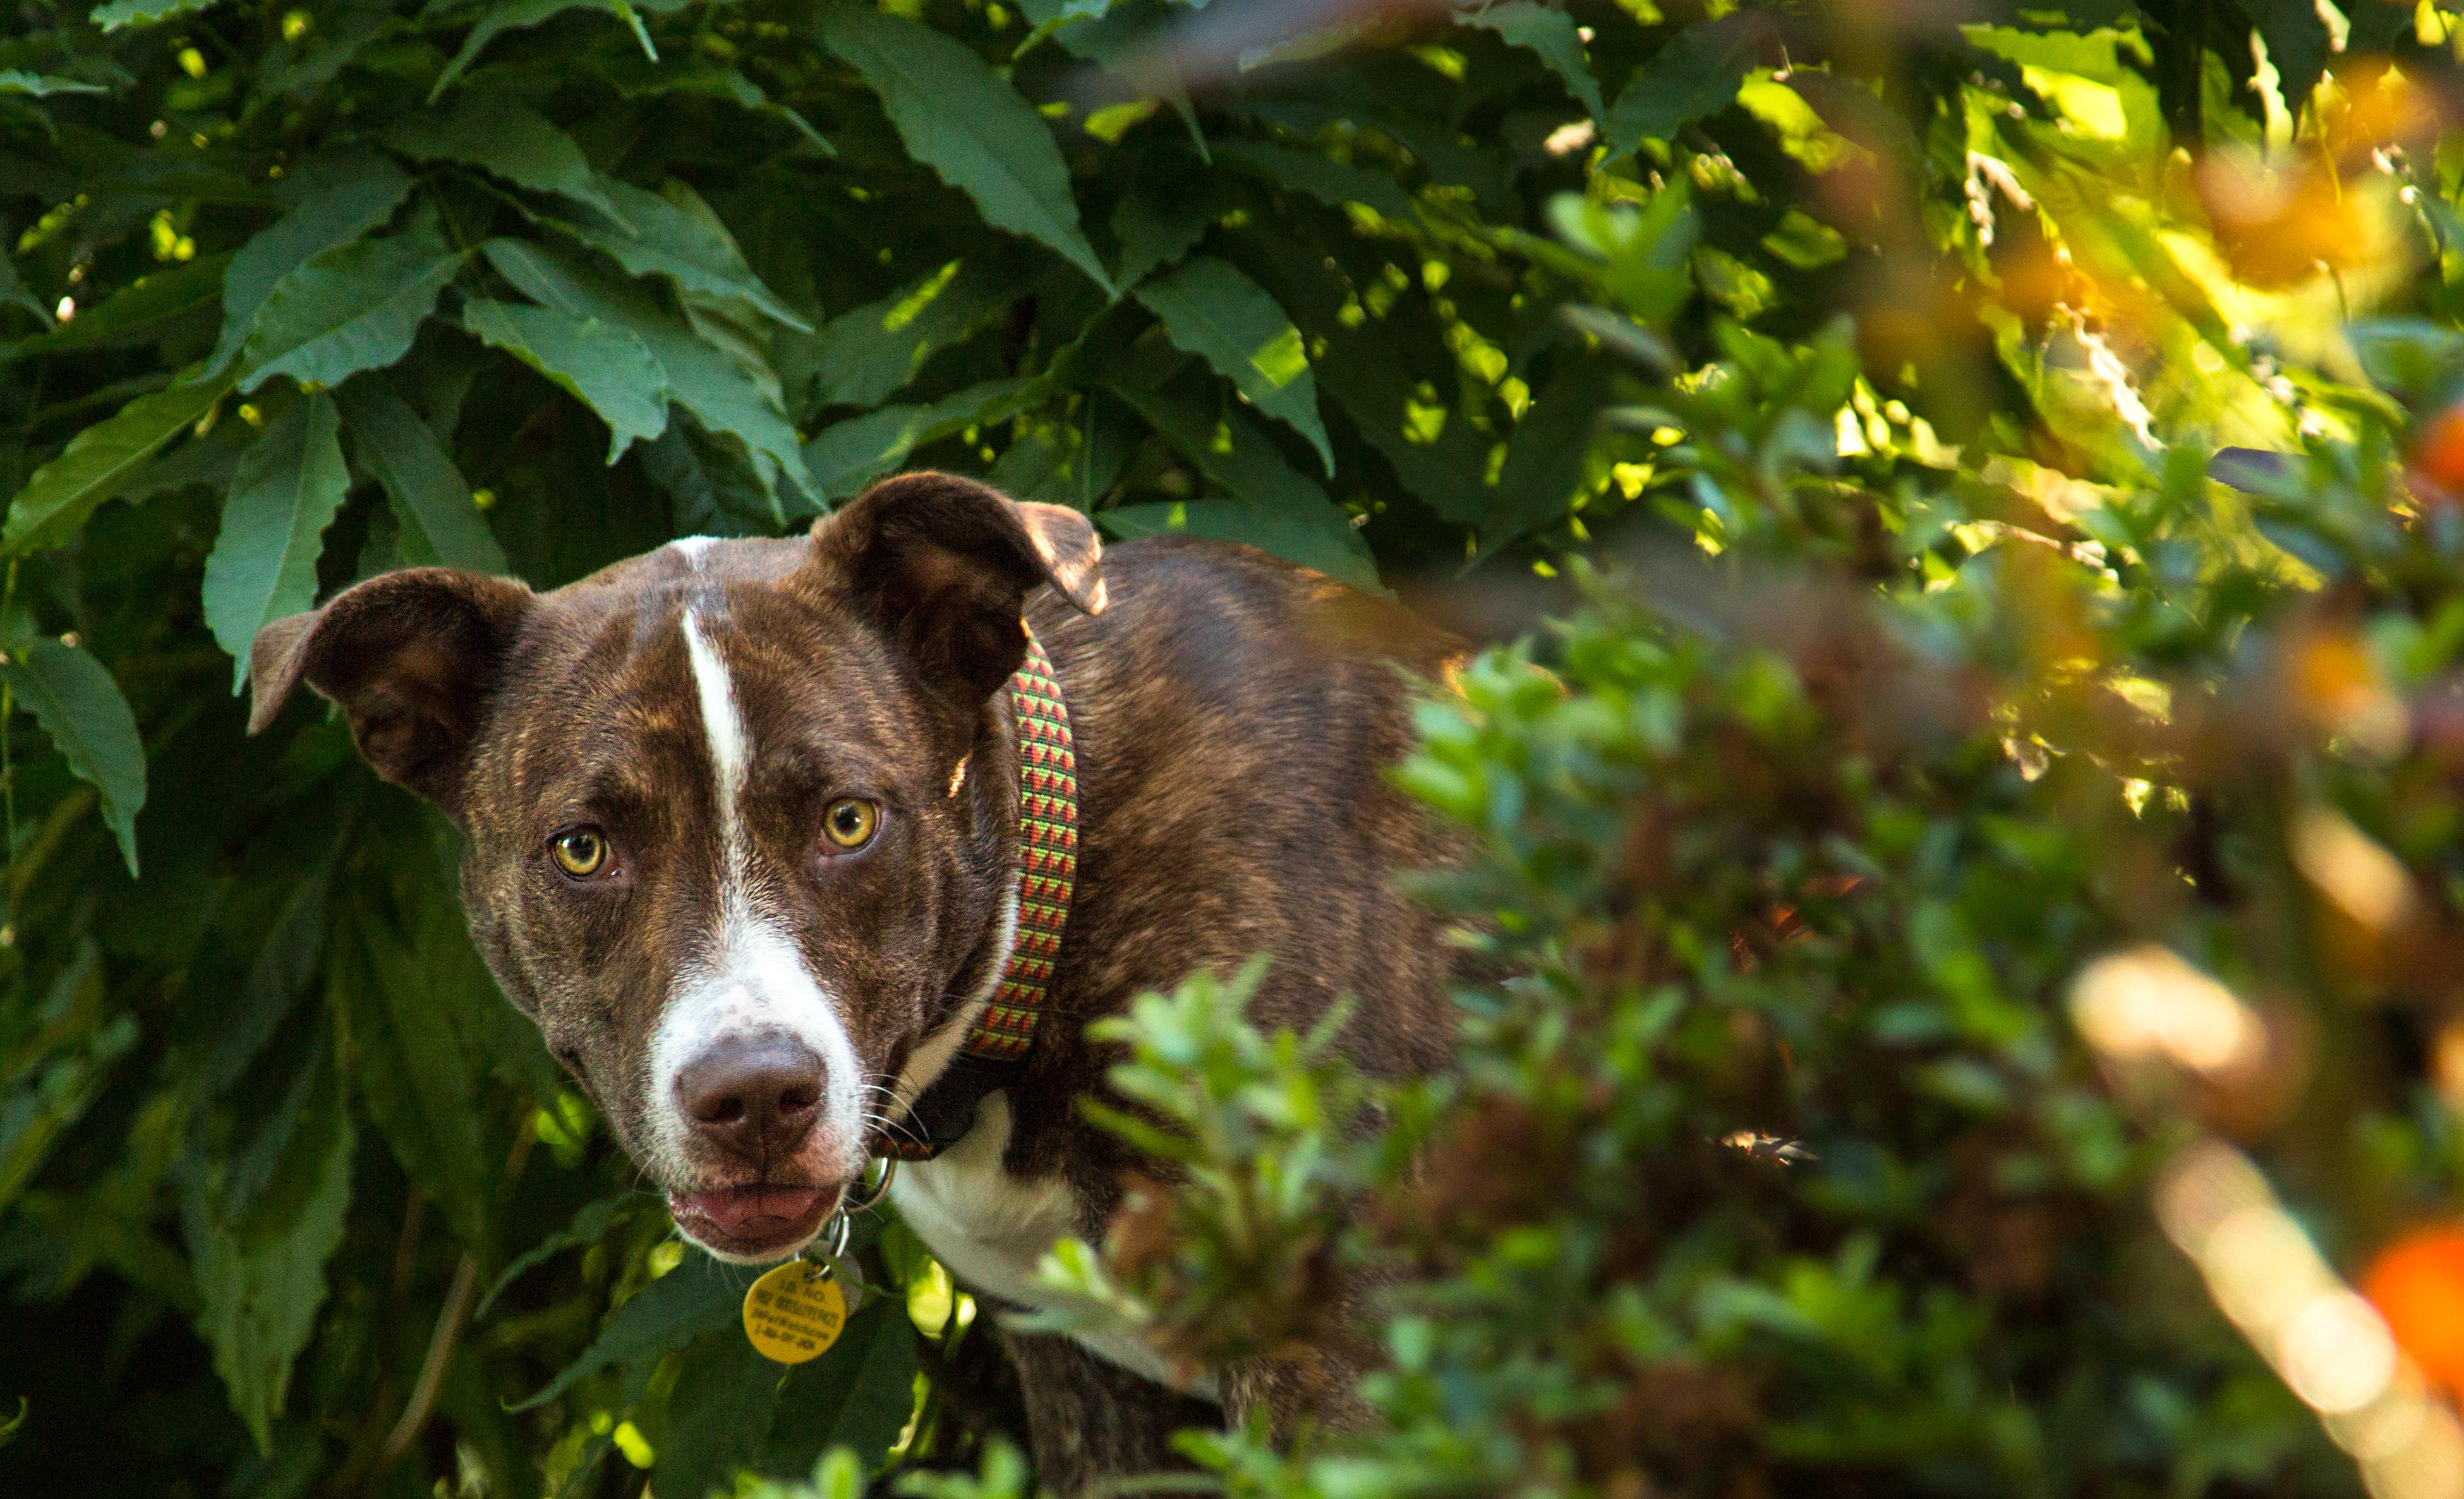 Fotos gratis : flor, casa, perrito, perro, animal, mascota, jardín ...